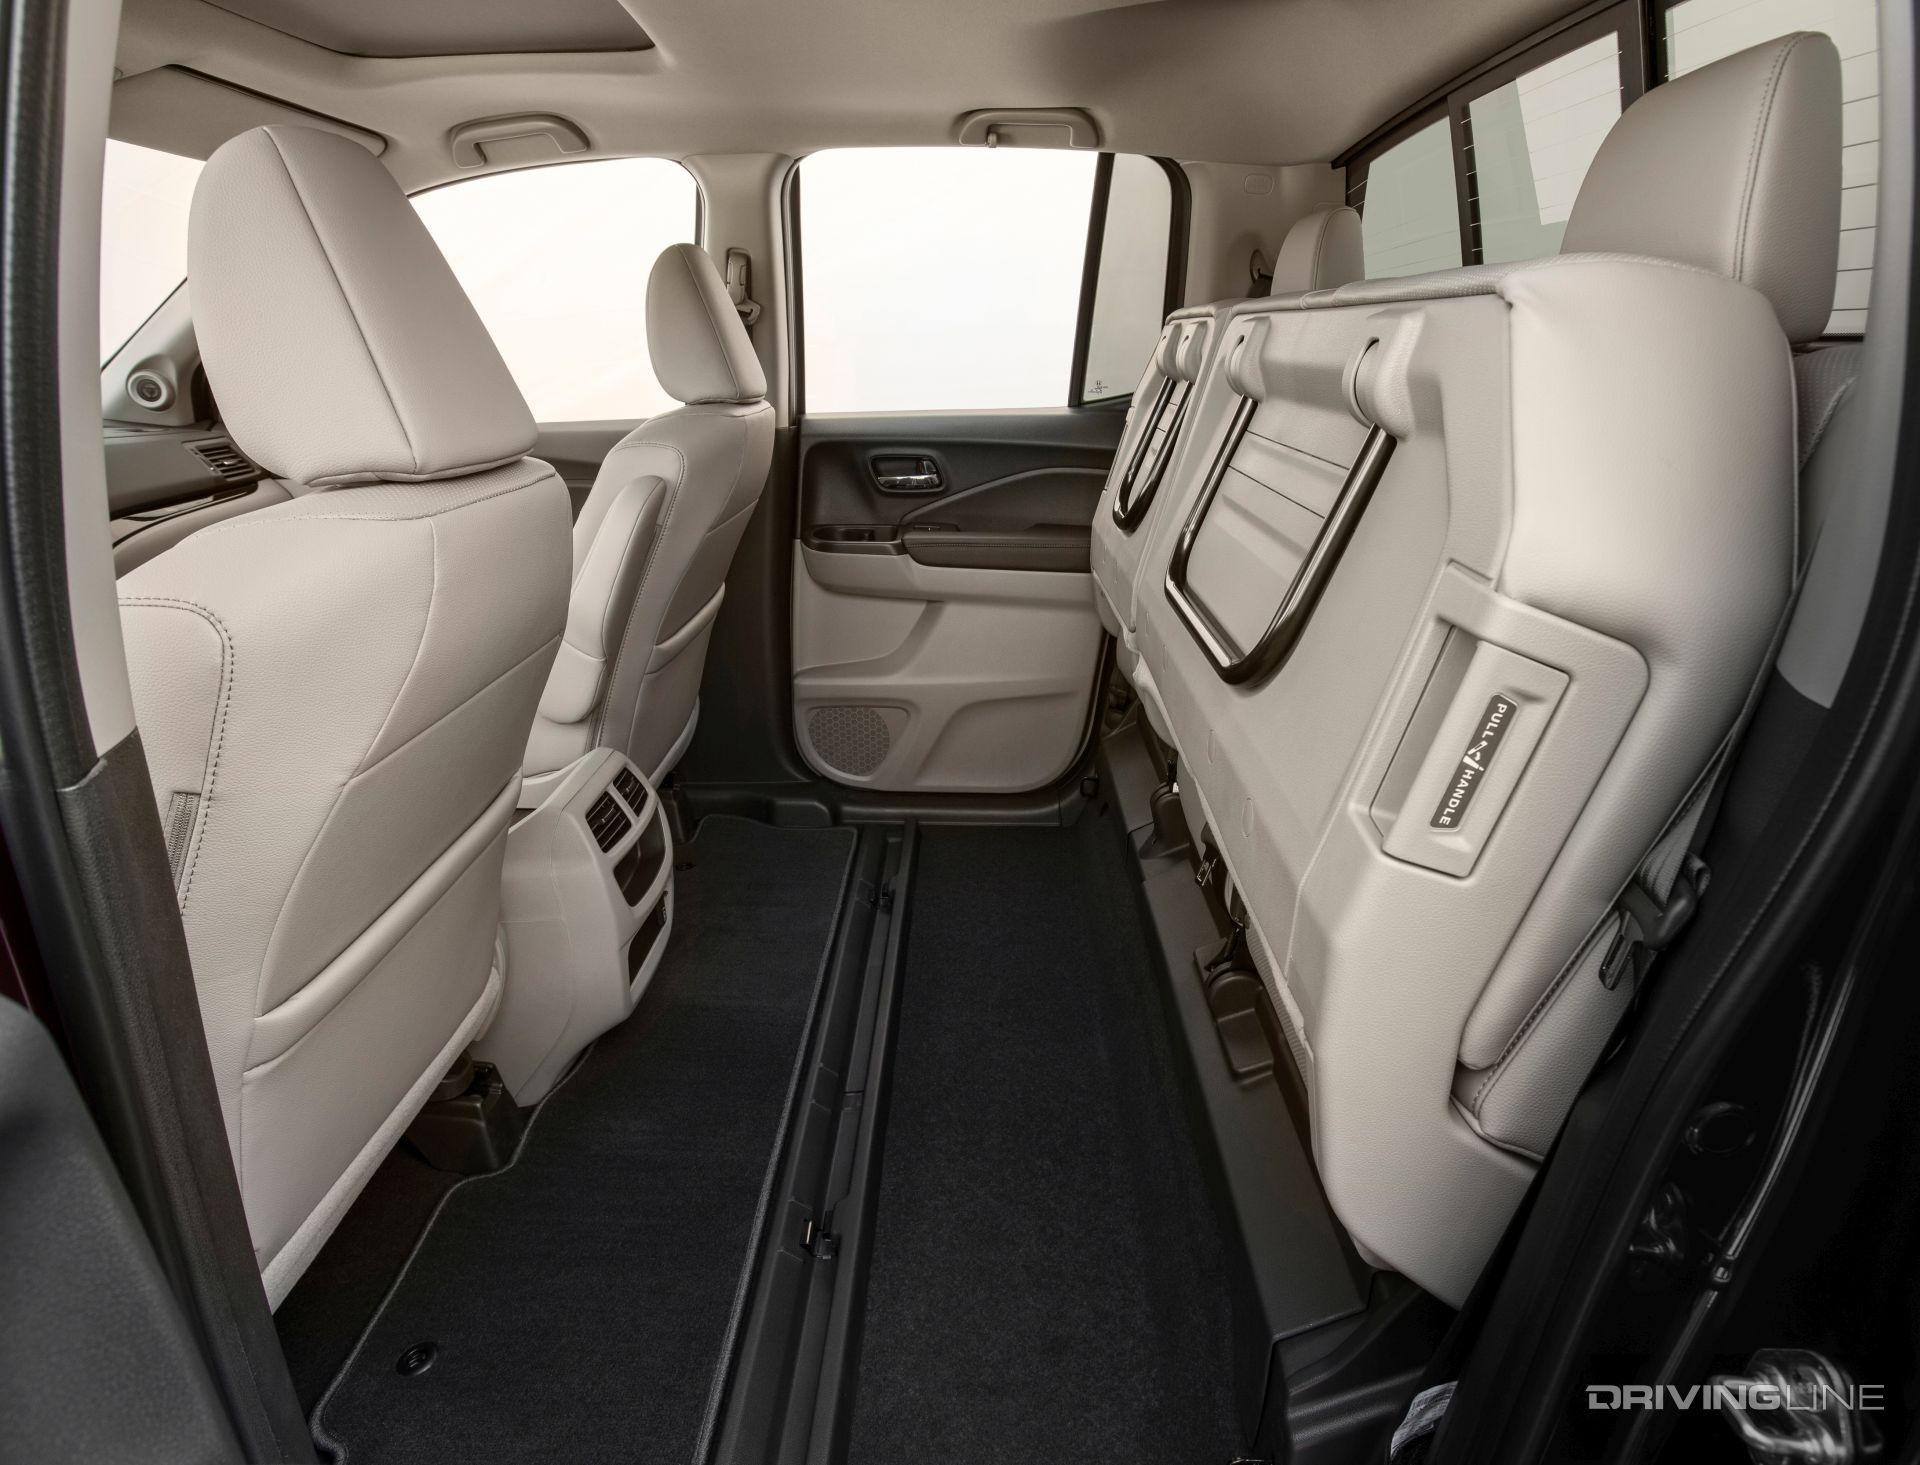 The 2018 Honda Ridgeline Review Drivingline